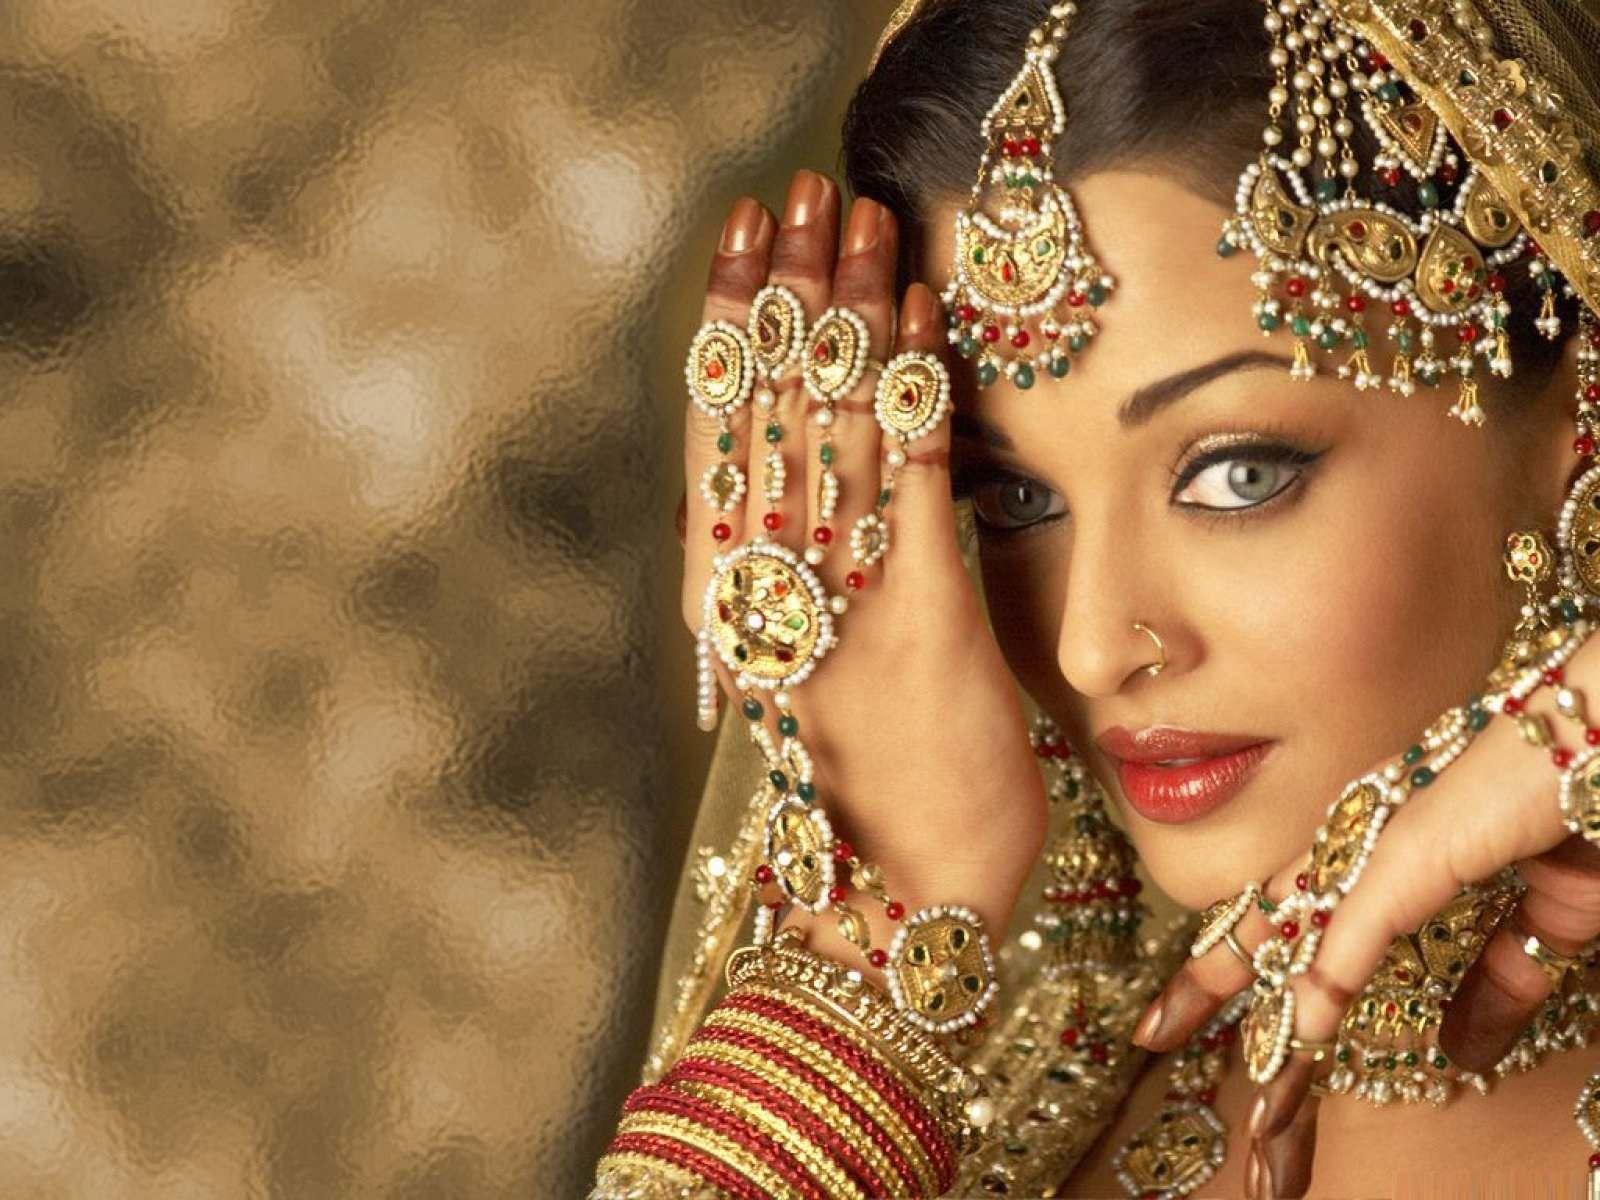 Aishwarya Rai HD Wallpaper | Free Wallpapers Download